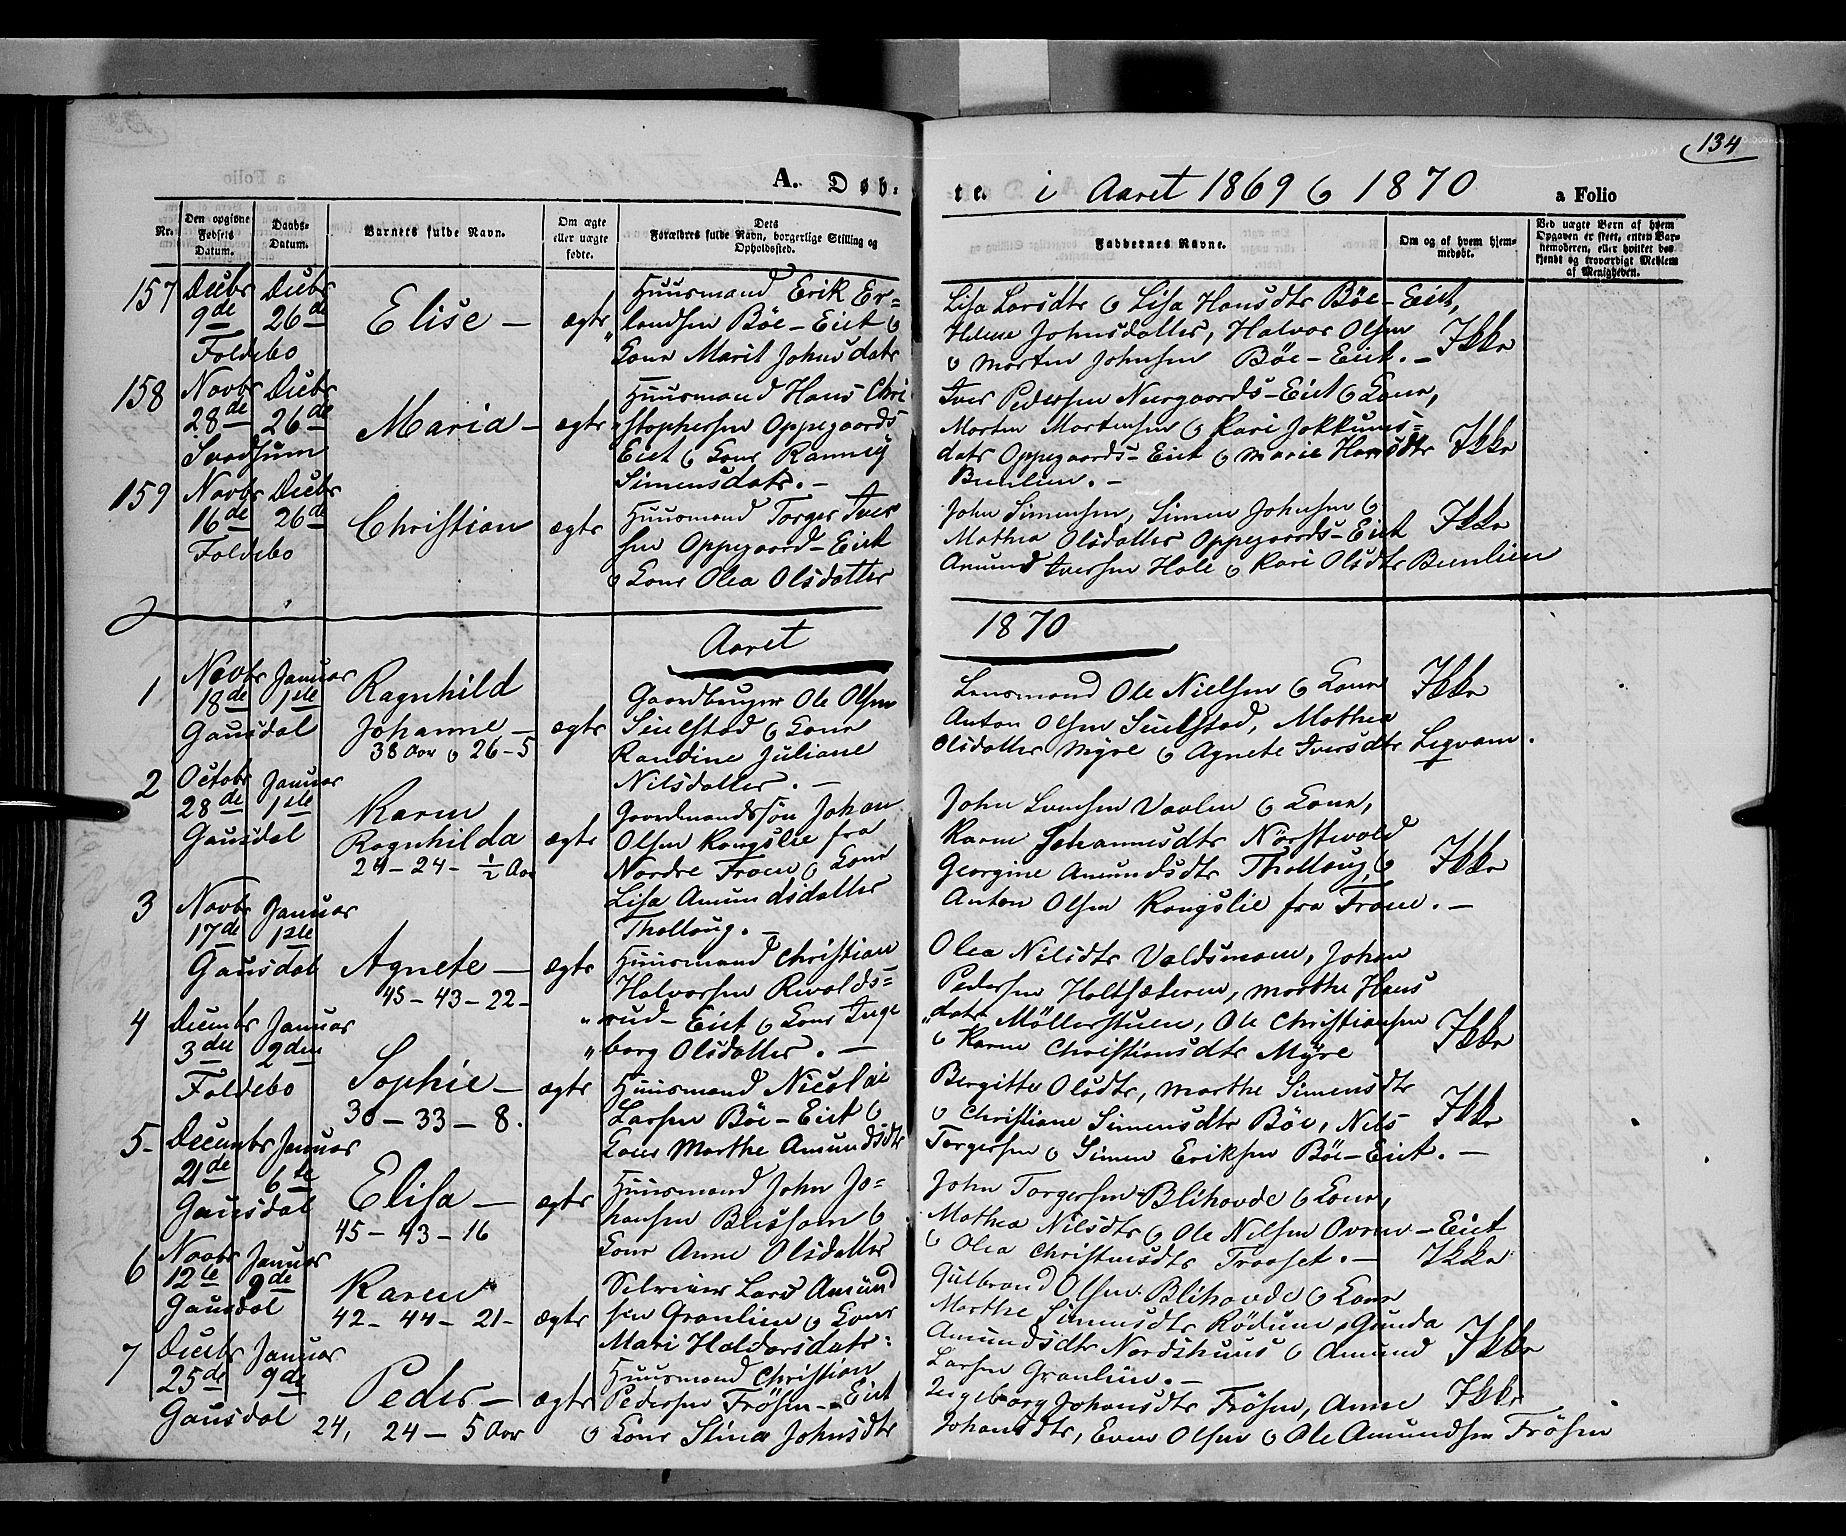 SAH, Gausdal prestekontor, Ministerialbok nr. 9, 1862-1873, s. 134